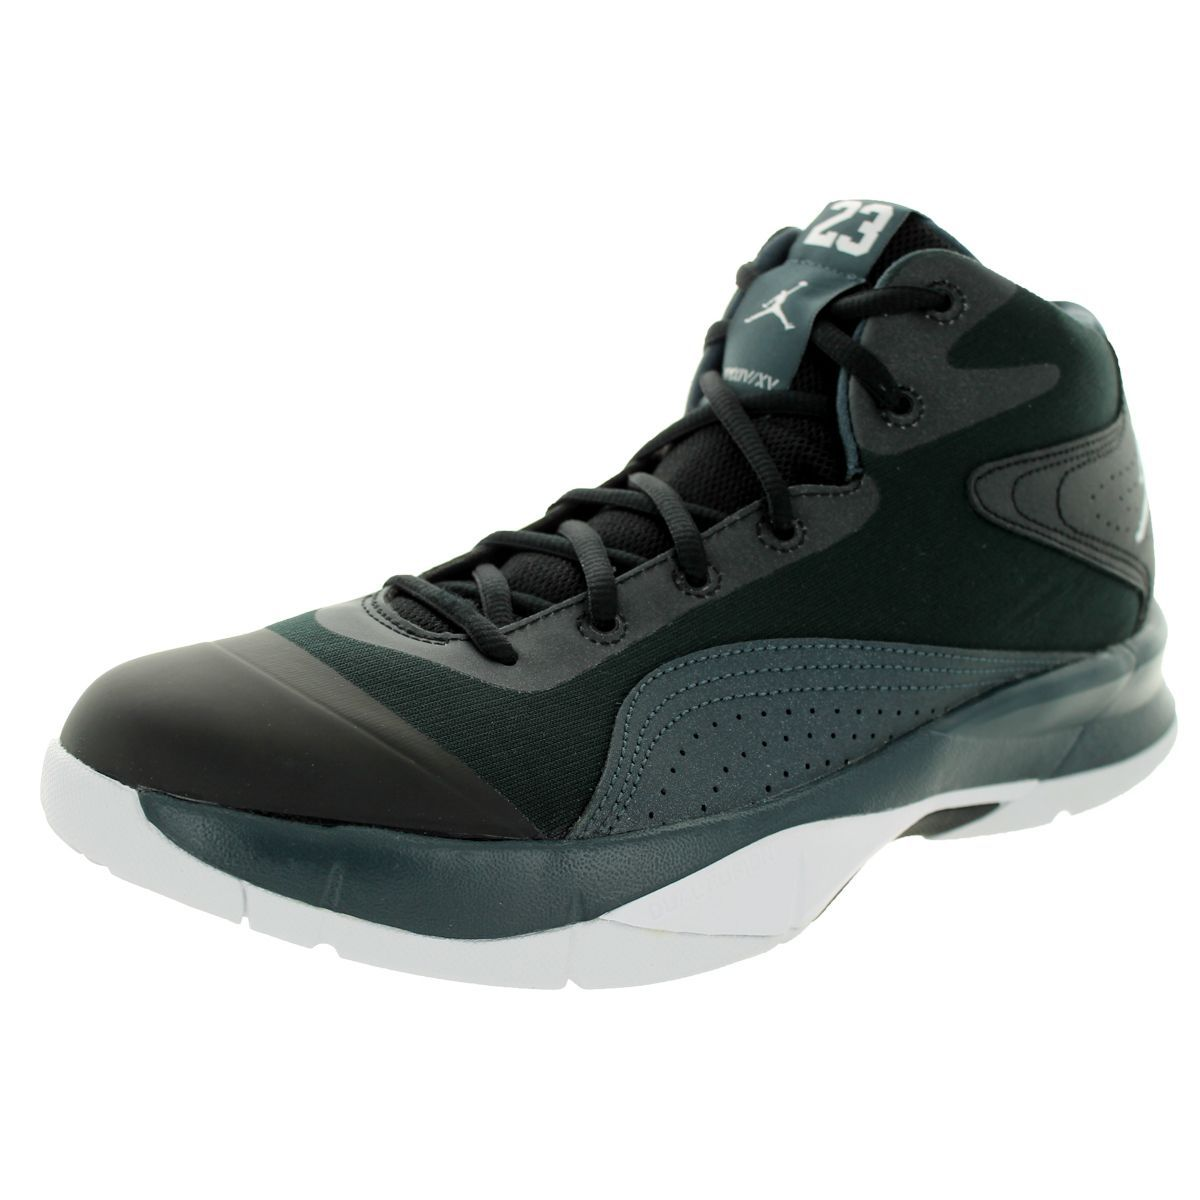 Nike Jordan Men's Jordan Court Vision 00 /White/Classic Charcl Basketball  Shoe